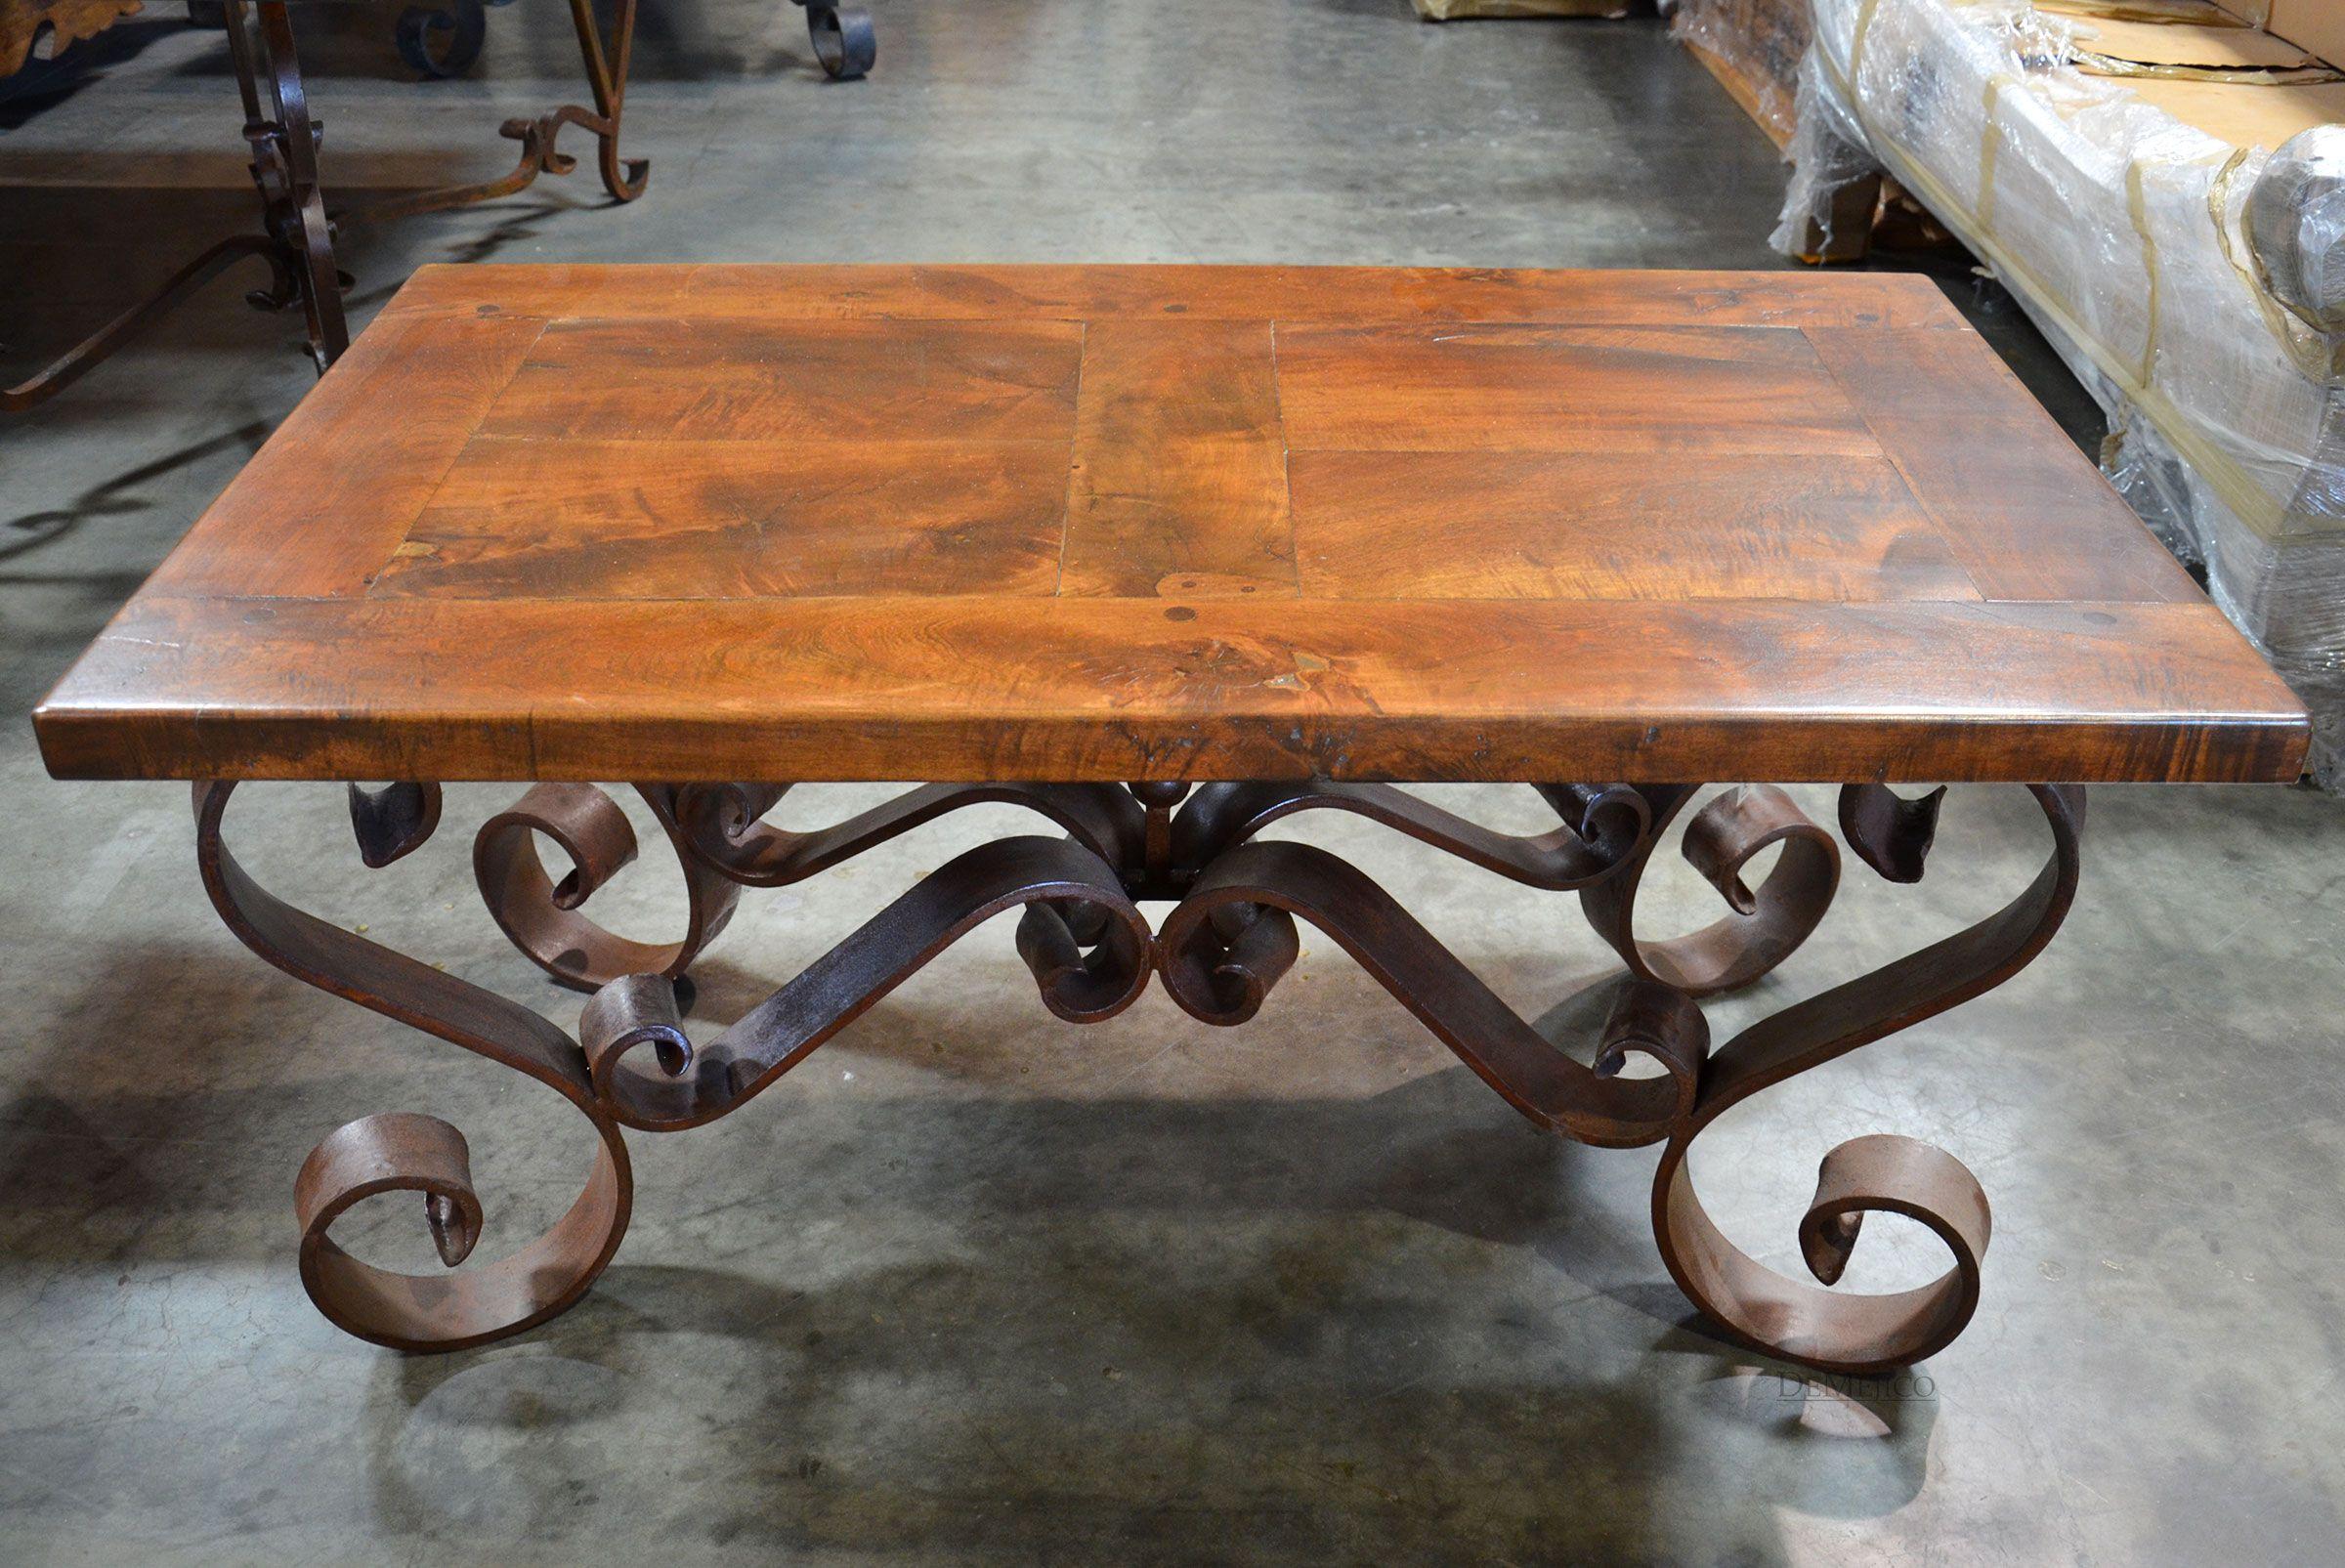 Rod Iron Coffee Table Google Search Iron Coffee Table Coffee Table Wood Coffee Table